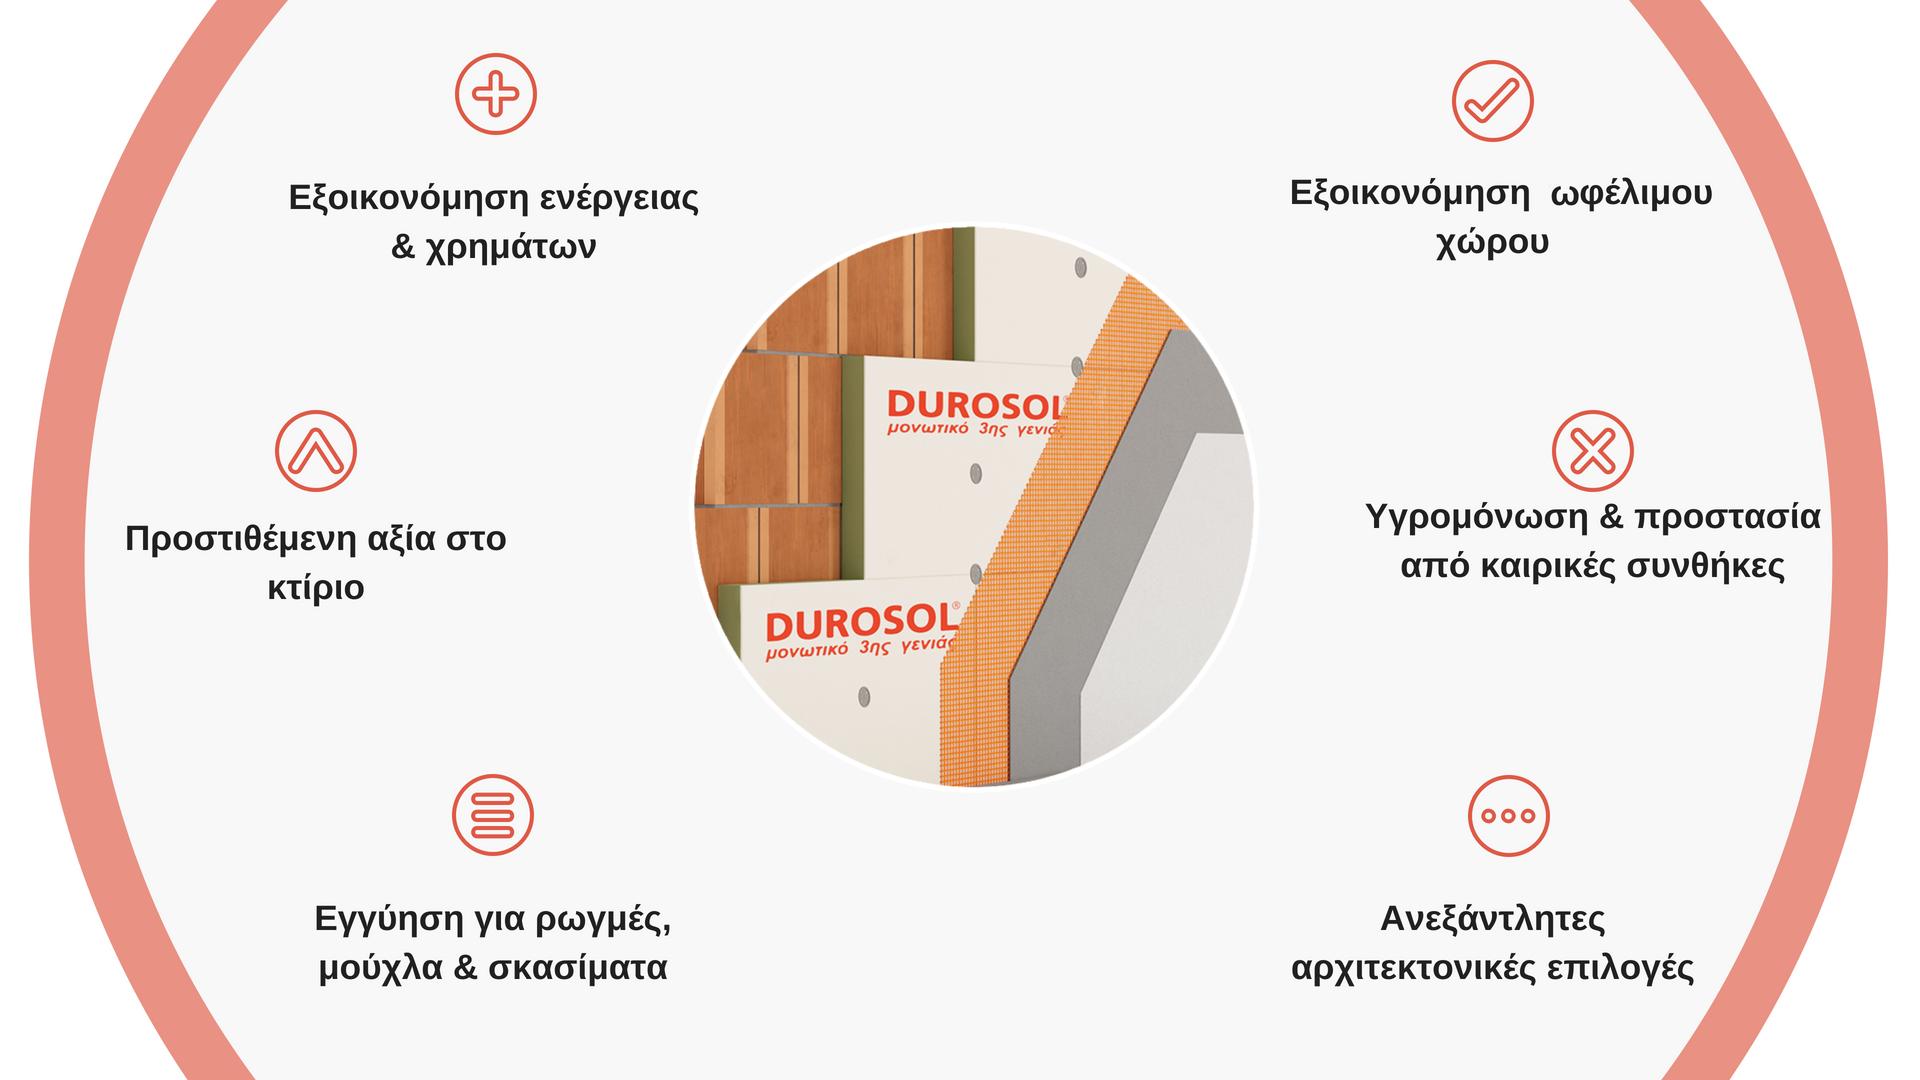 Infographic σχετικά με τα πλεονεκτήματα που χαρίζει το θερμομονωτικό υλικό durosol στο ακίνητο που πραγματοποιείται εξωτερική θερμομόνωση με αυτό.